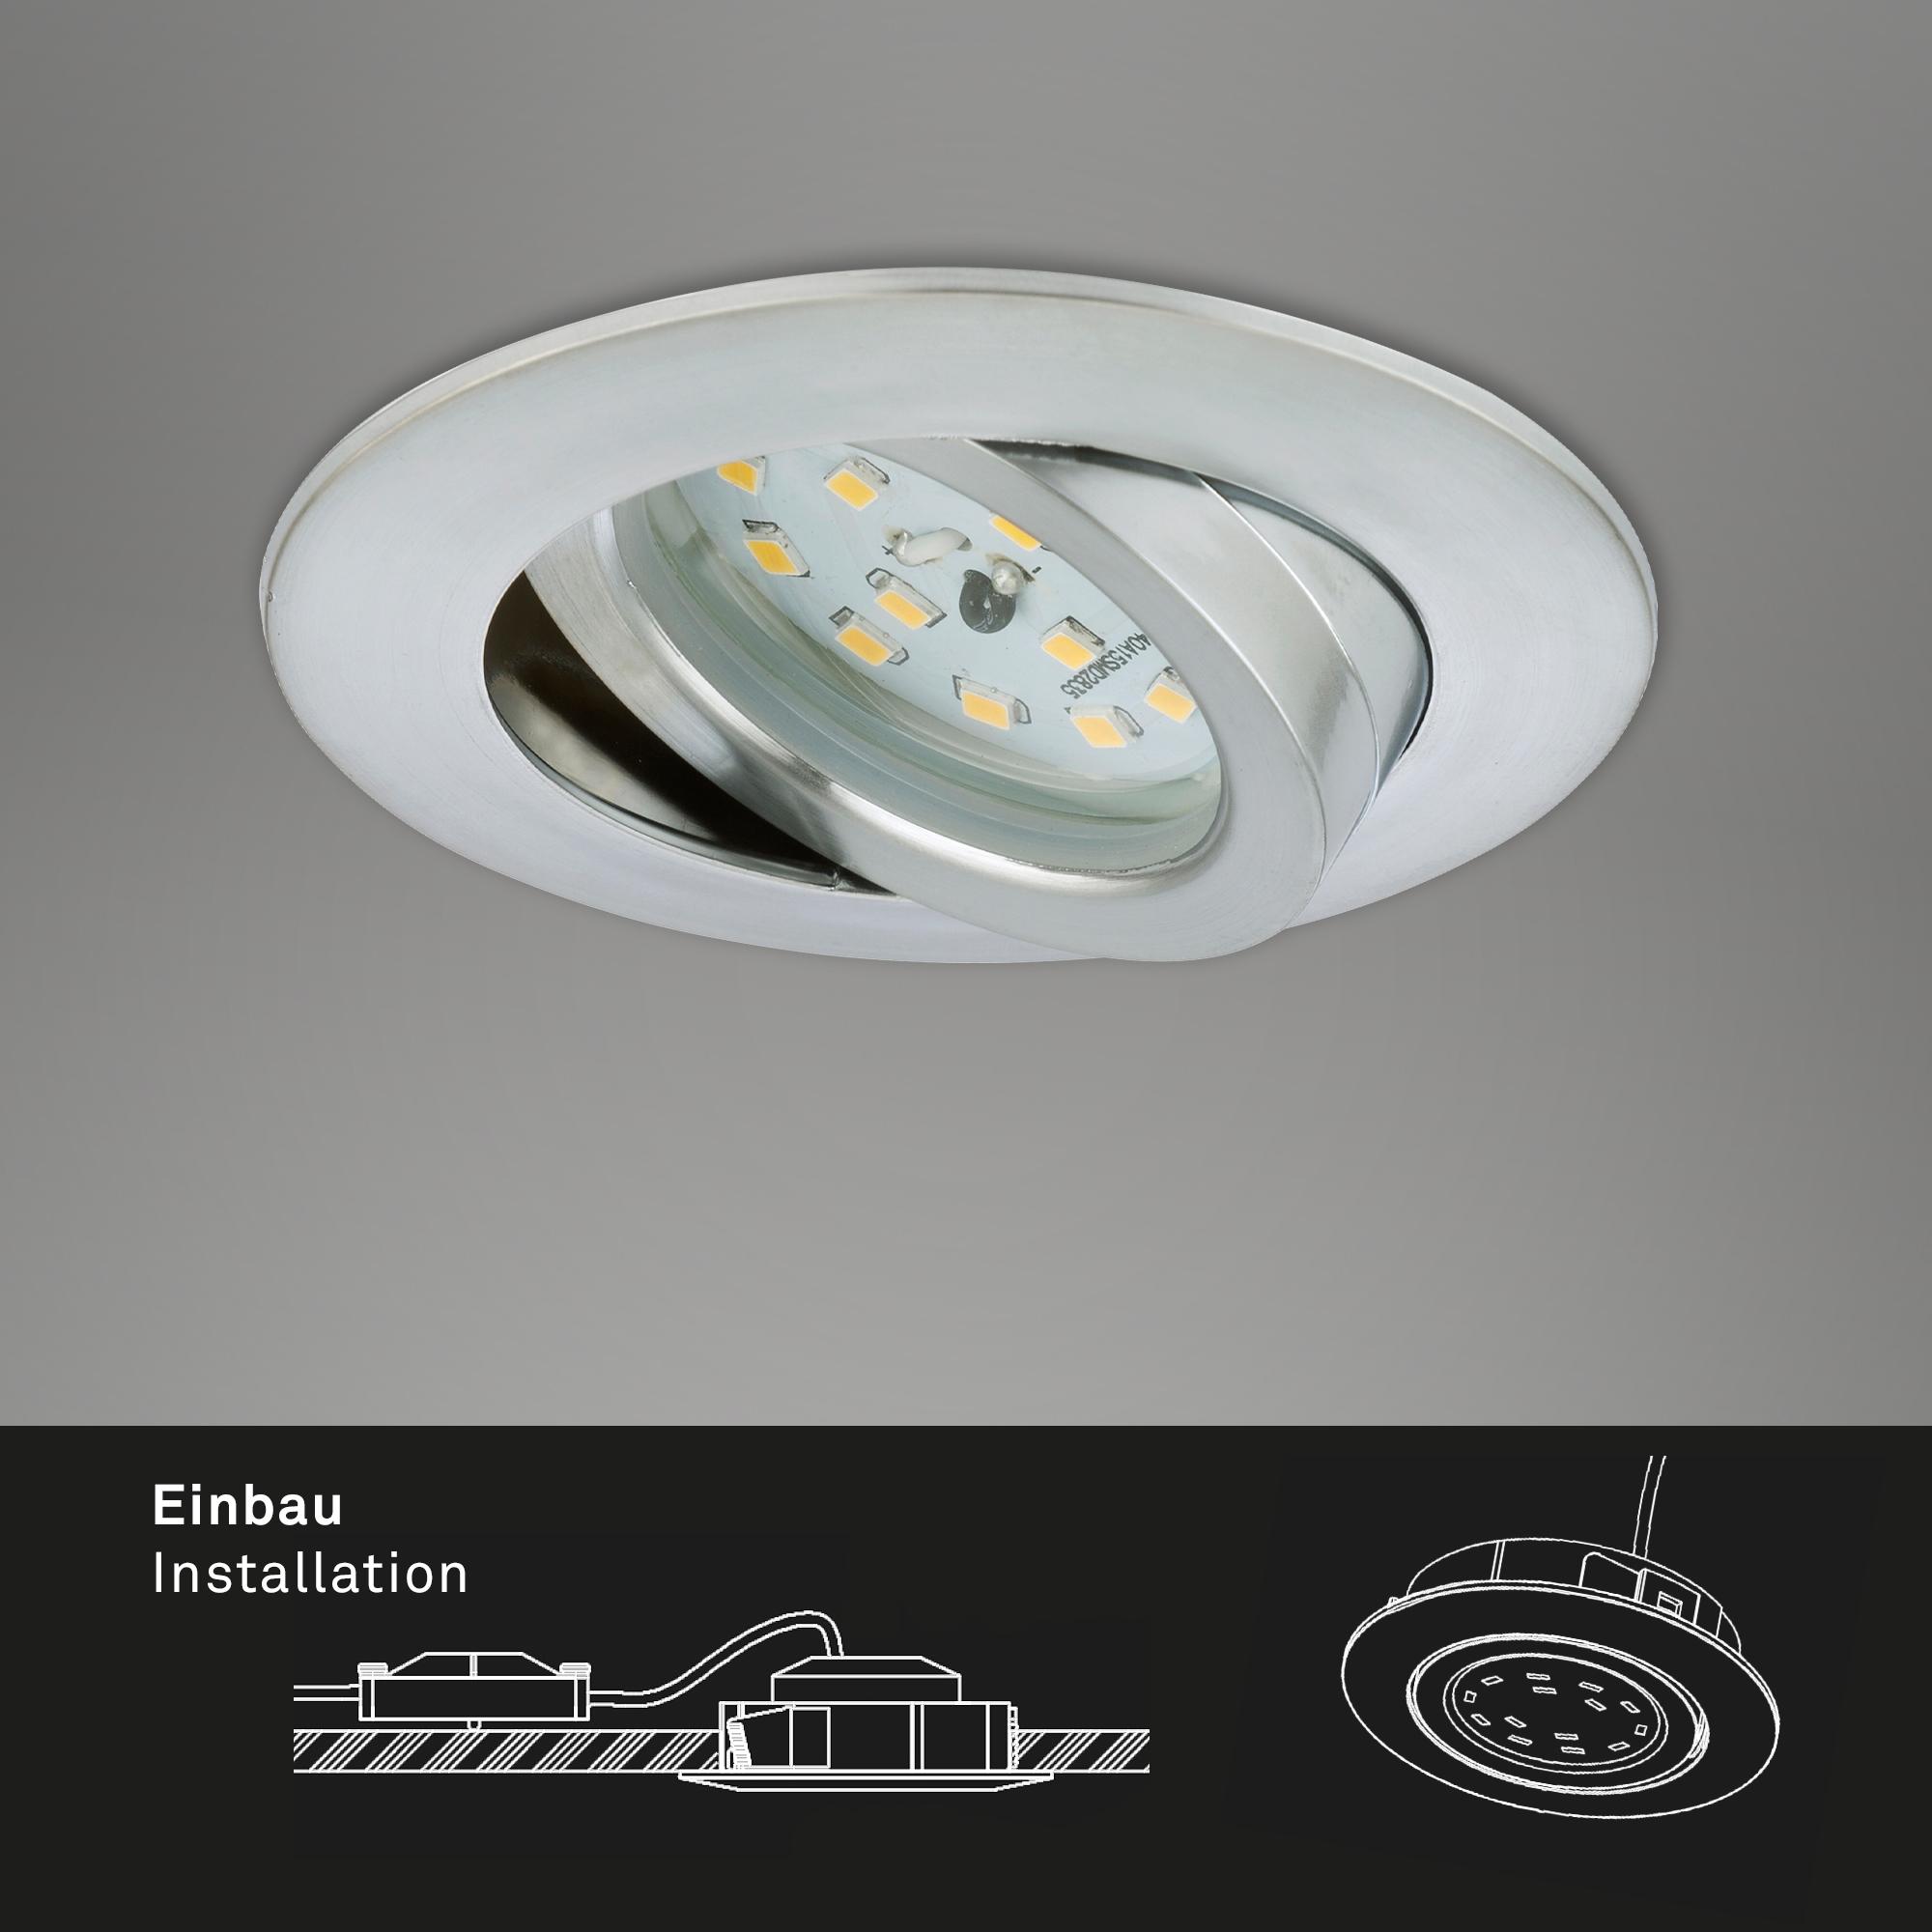 LED Einbauleuchte, Ø 8,2 cm, 6,5 W, Alu